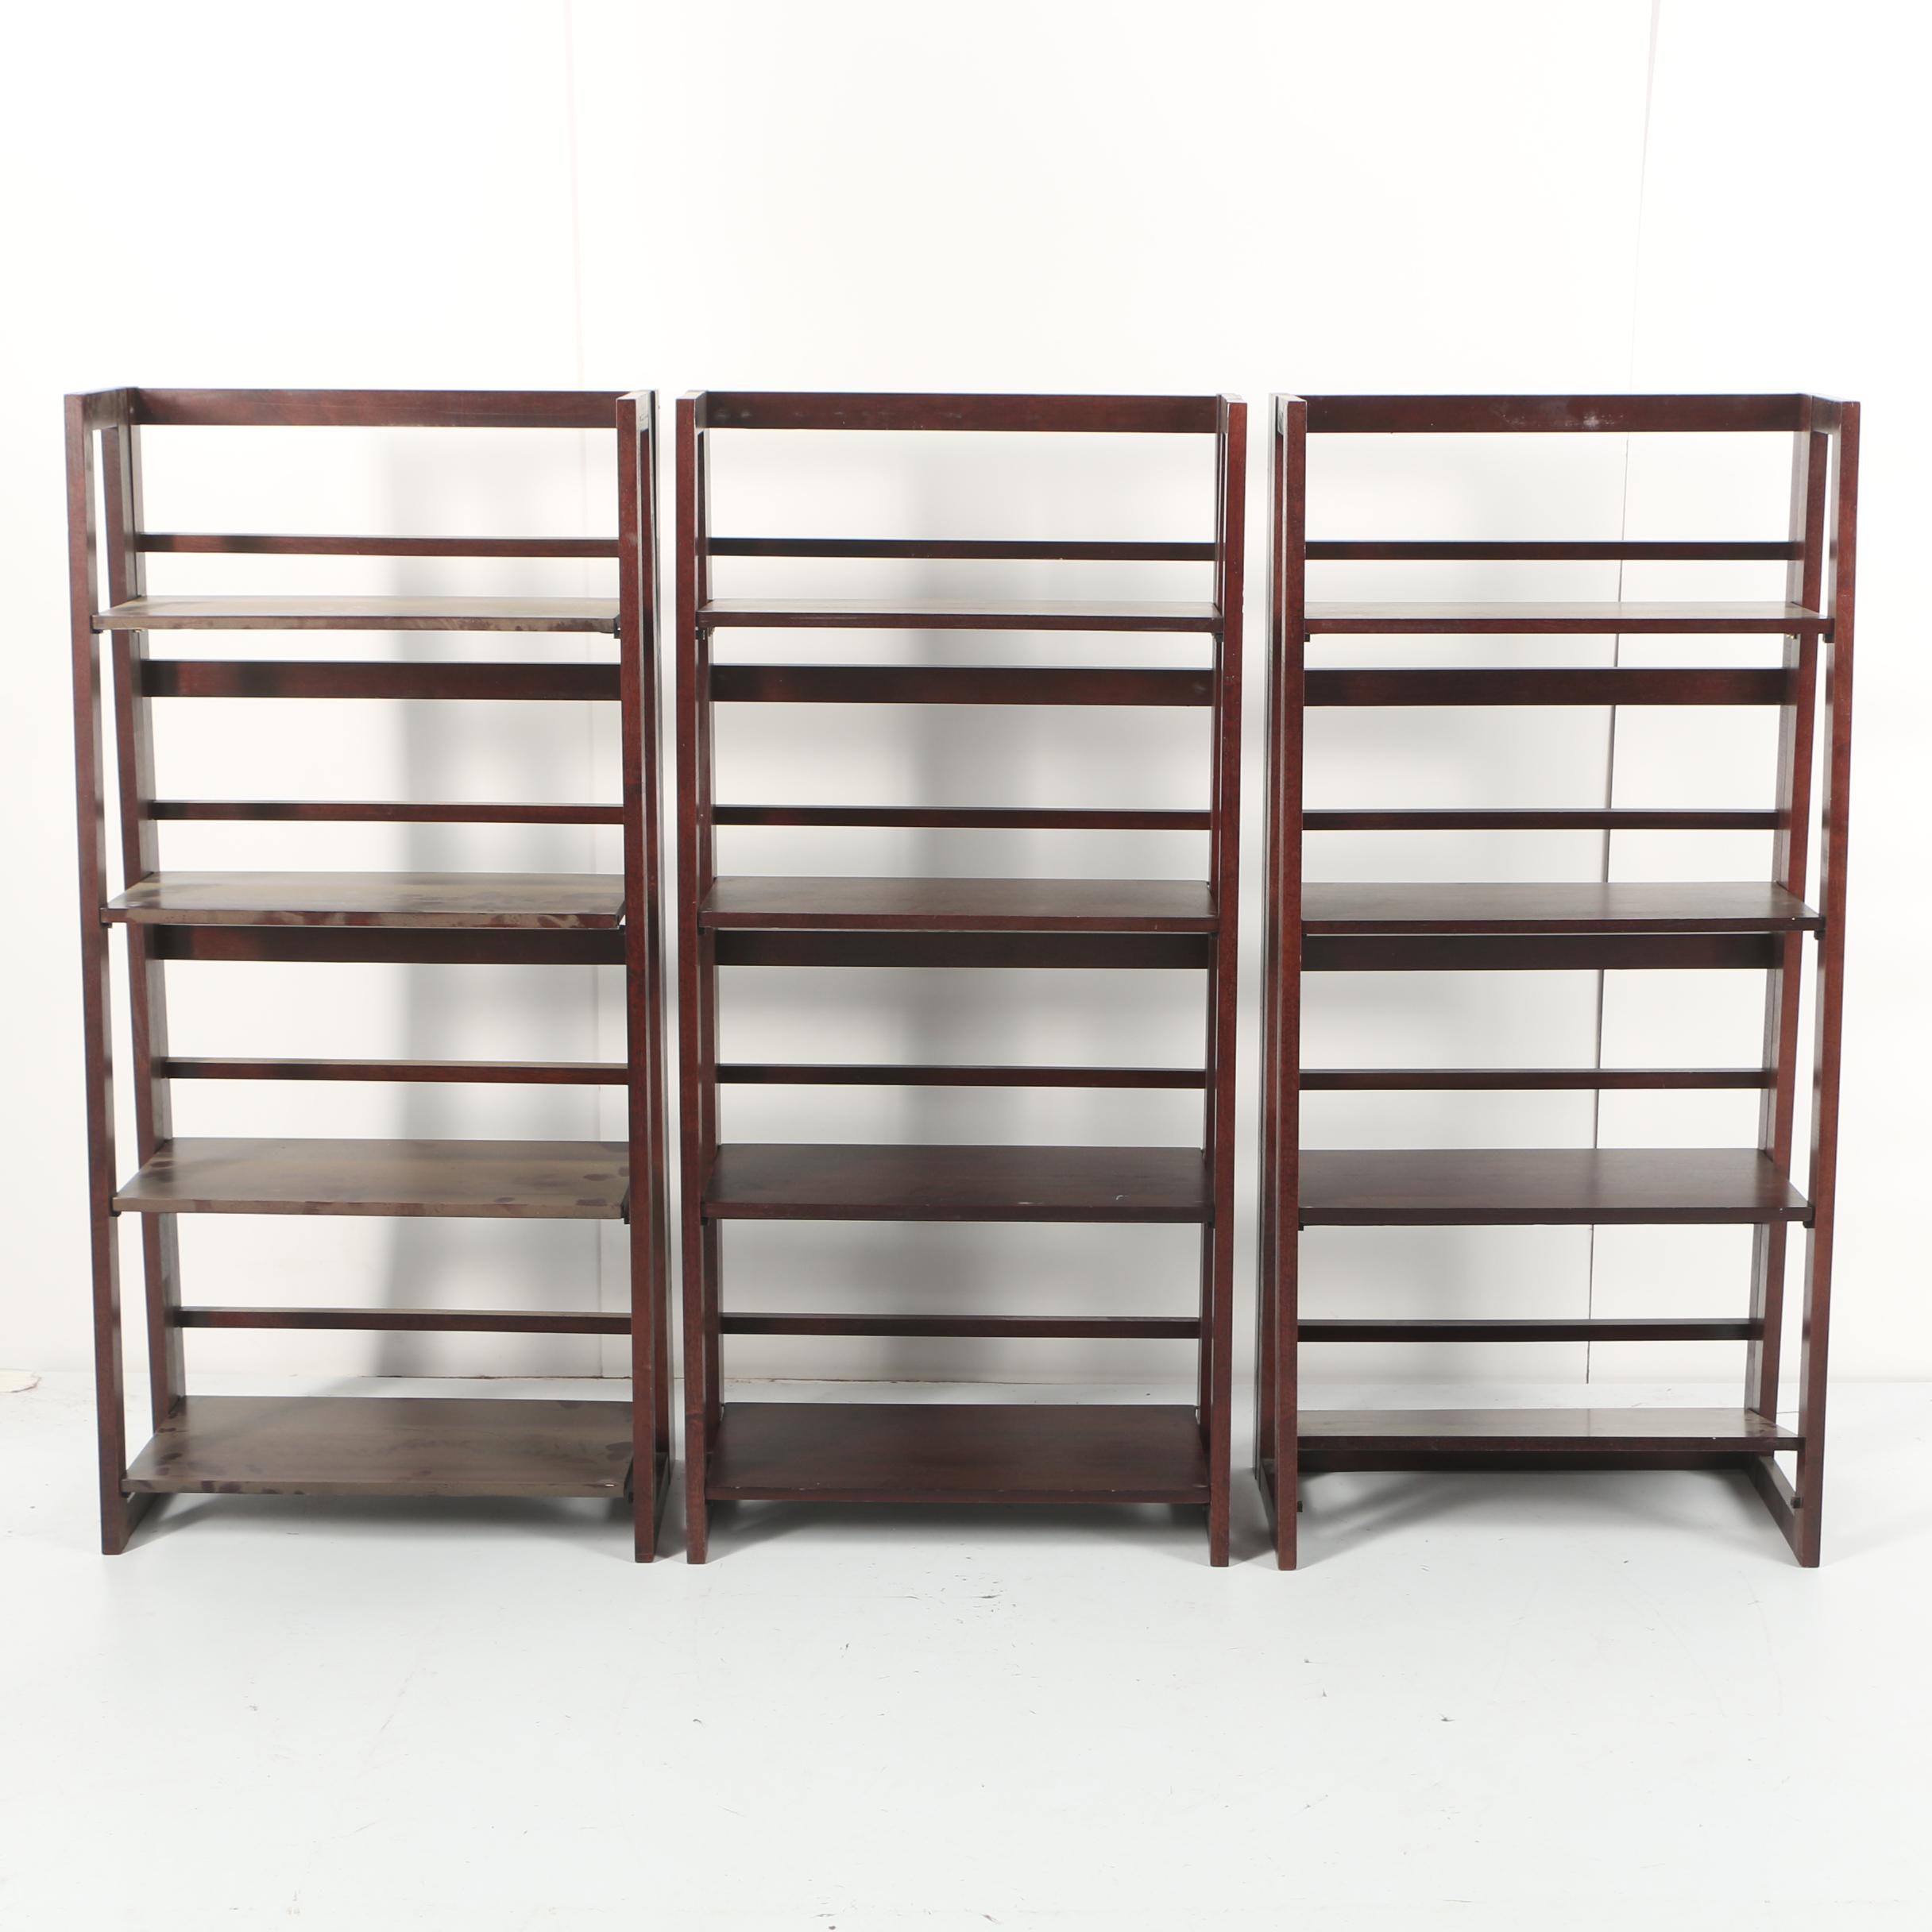 Three Folding Book Shelves